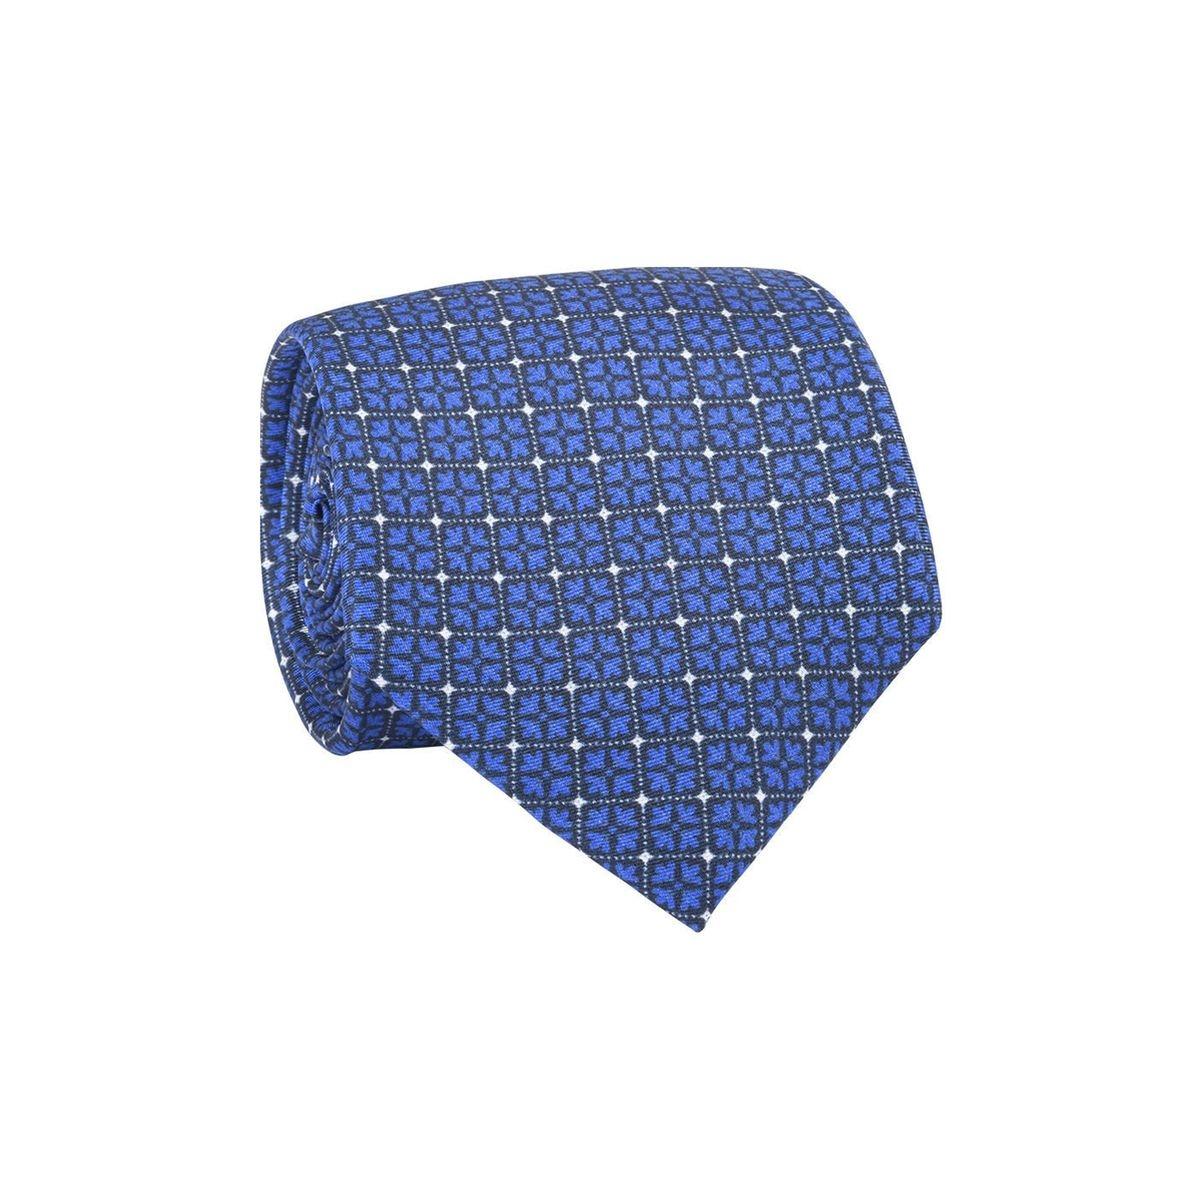 Cravate homme fleurs carrées Bleu marine / Bleu royal